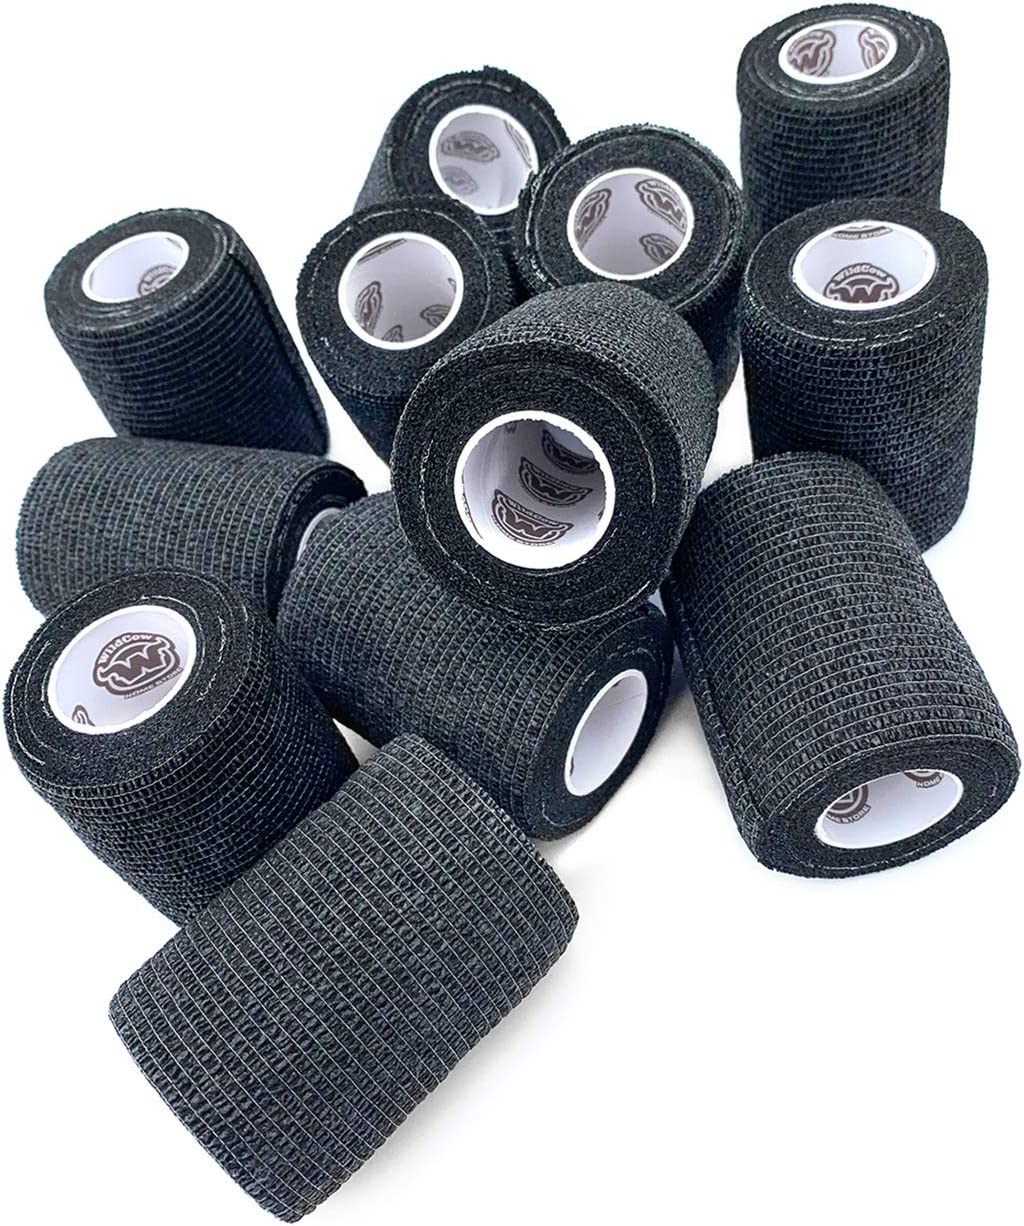 WildCow 3 Vet Wrap Tape Bulk Self Adherent Grip Rolls Solid Colors /… 12 Pack Cohesive Bandage Wraps